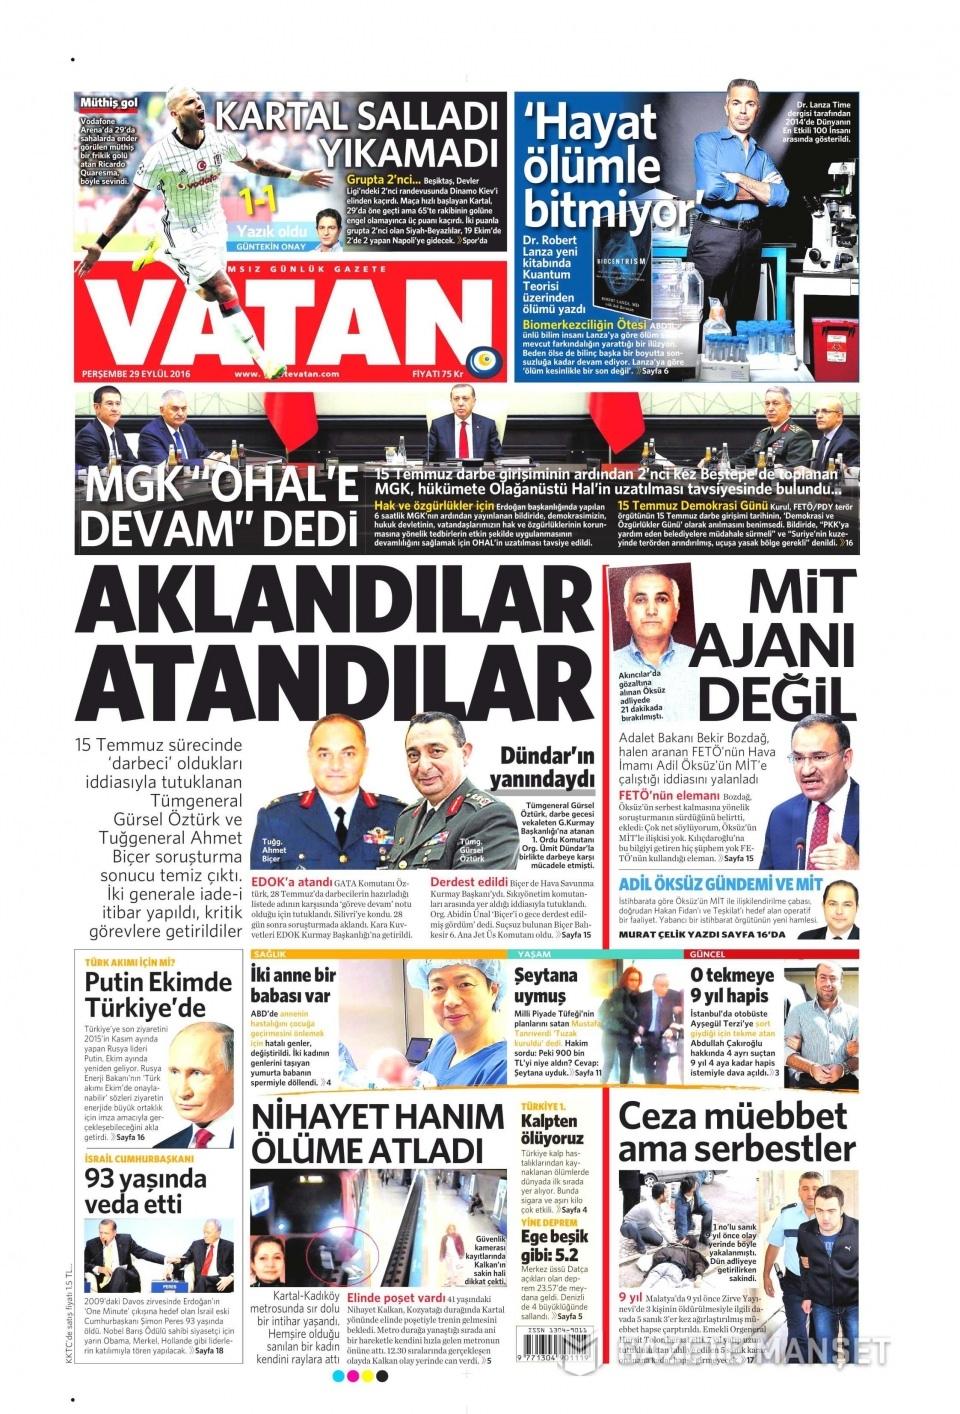 29 Eylül Perşembe gazete manşetleri 2